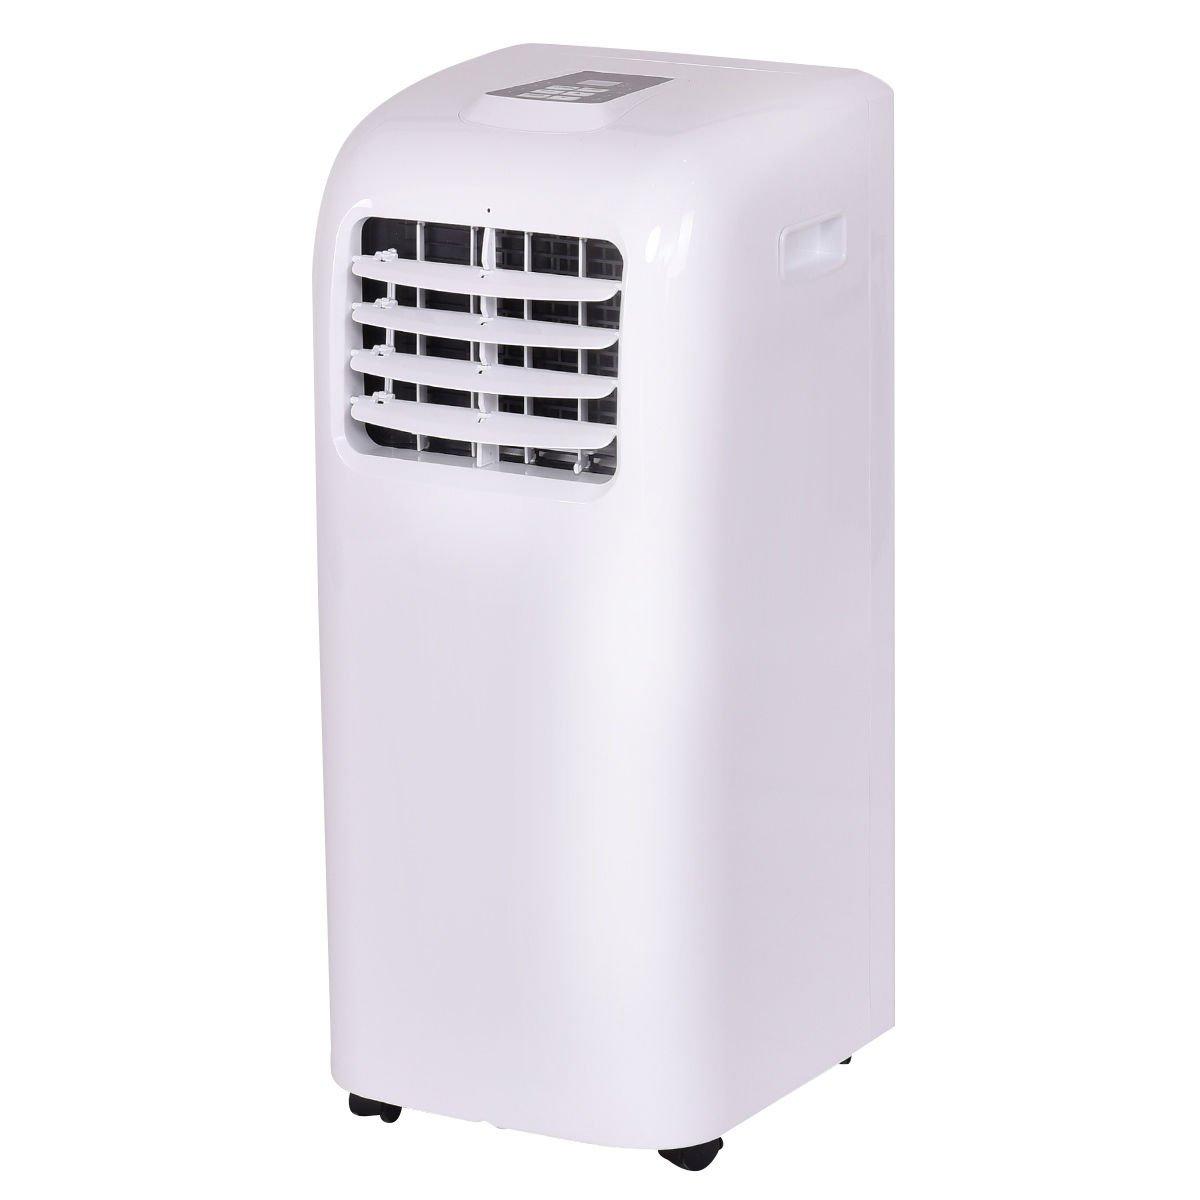 Costway 10,000 BTU Portable Air Conditioner Dehumidifier Function Window Wall Mount w/ Remote Control by COSTWAY